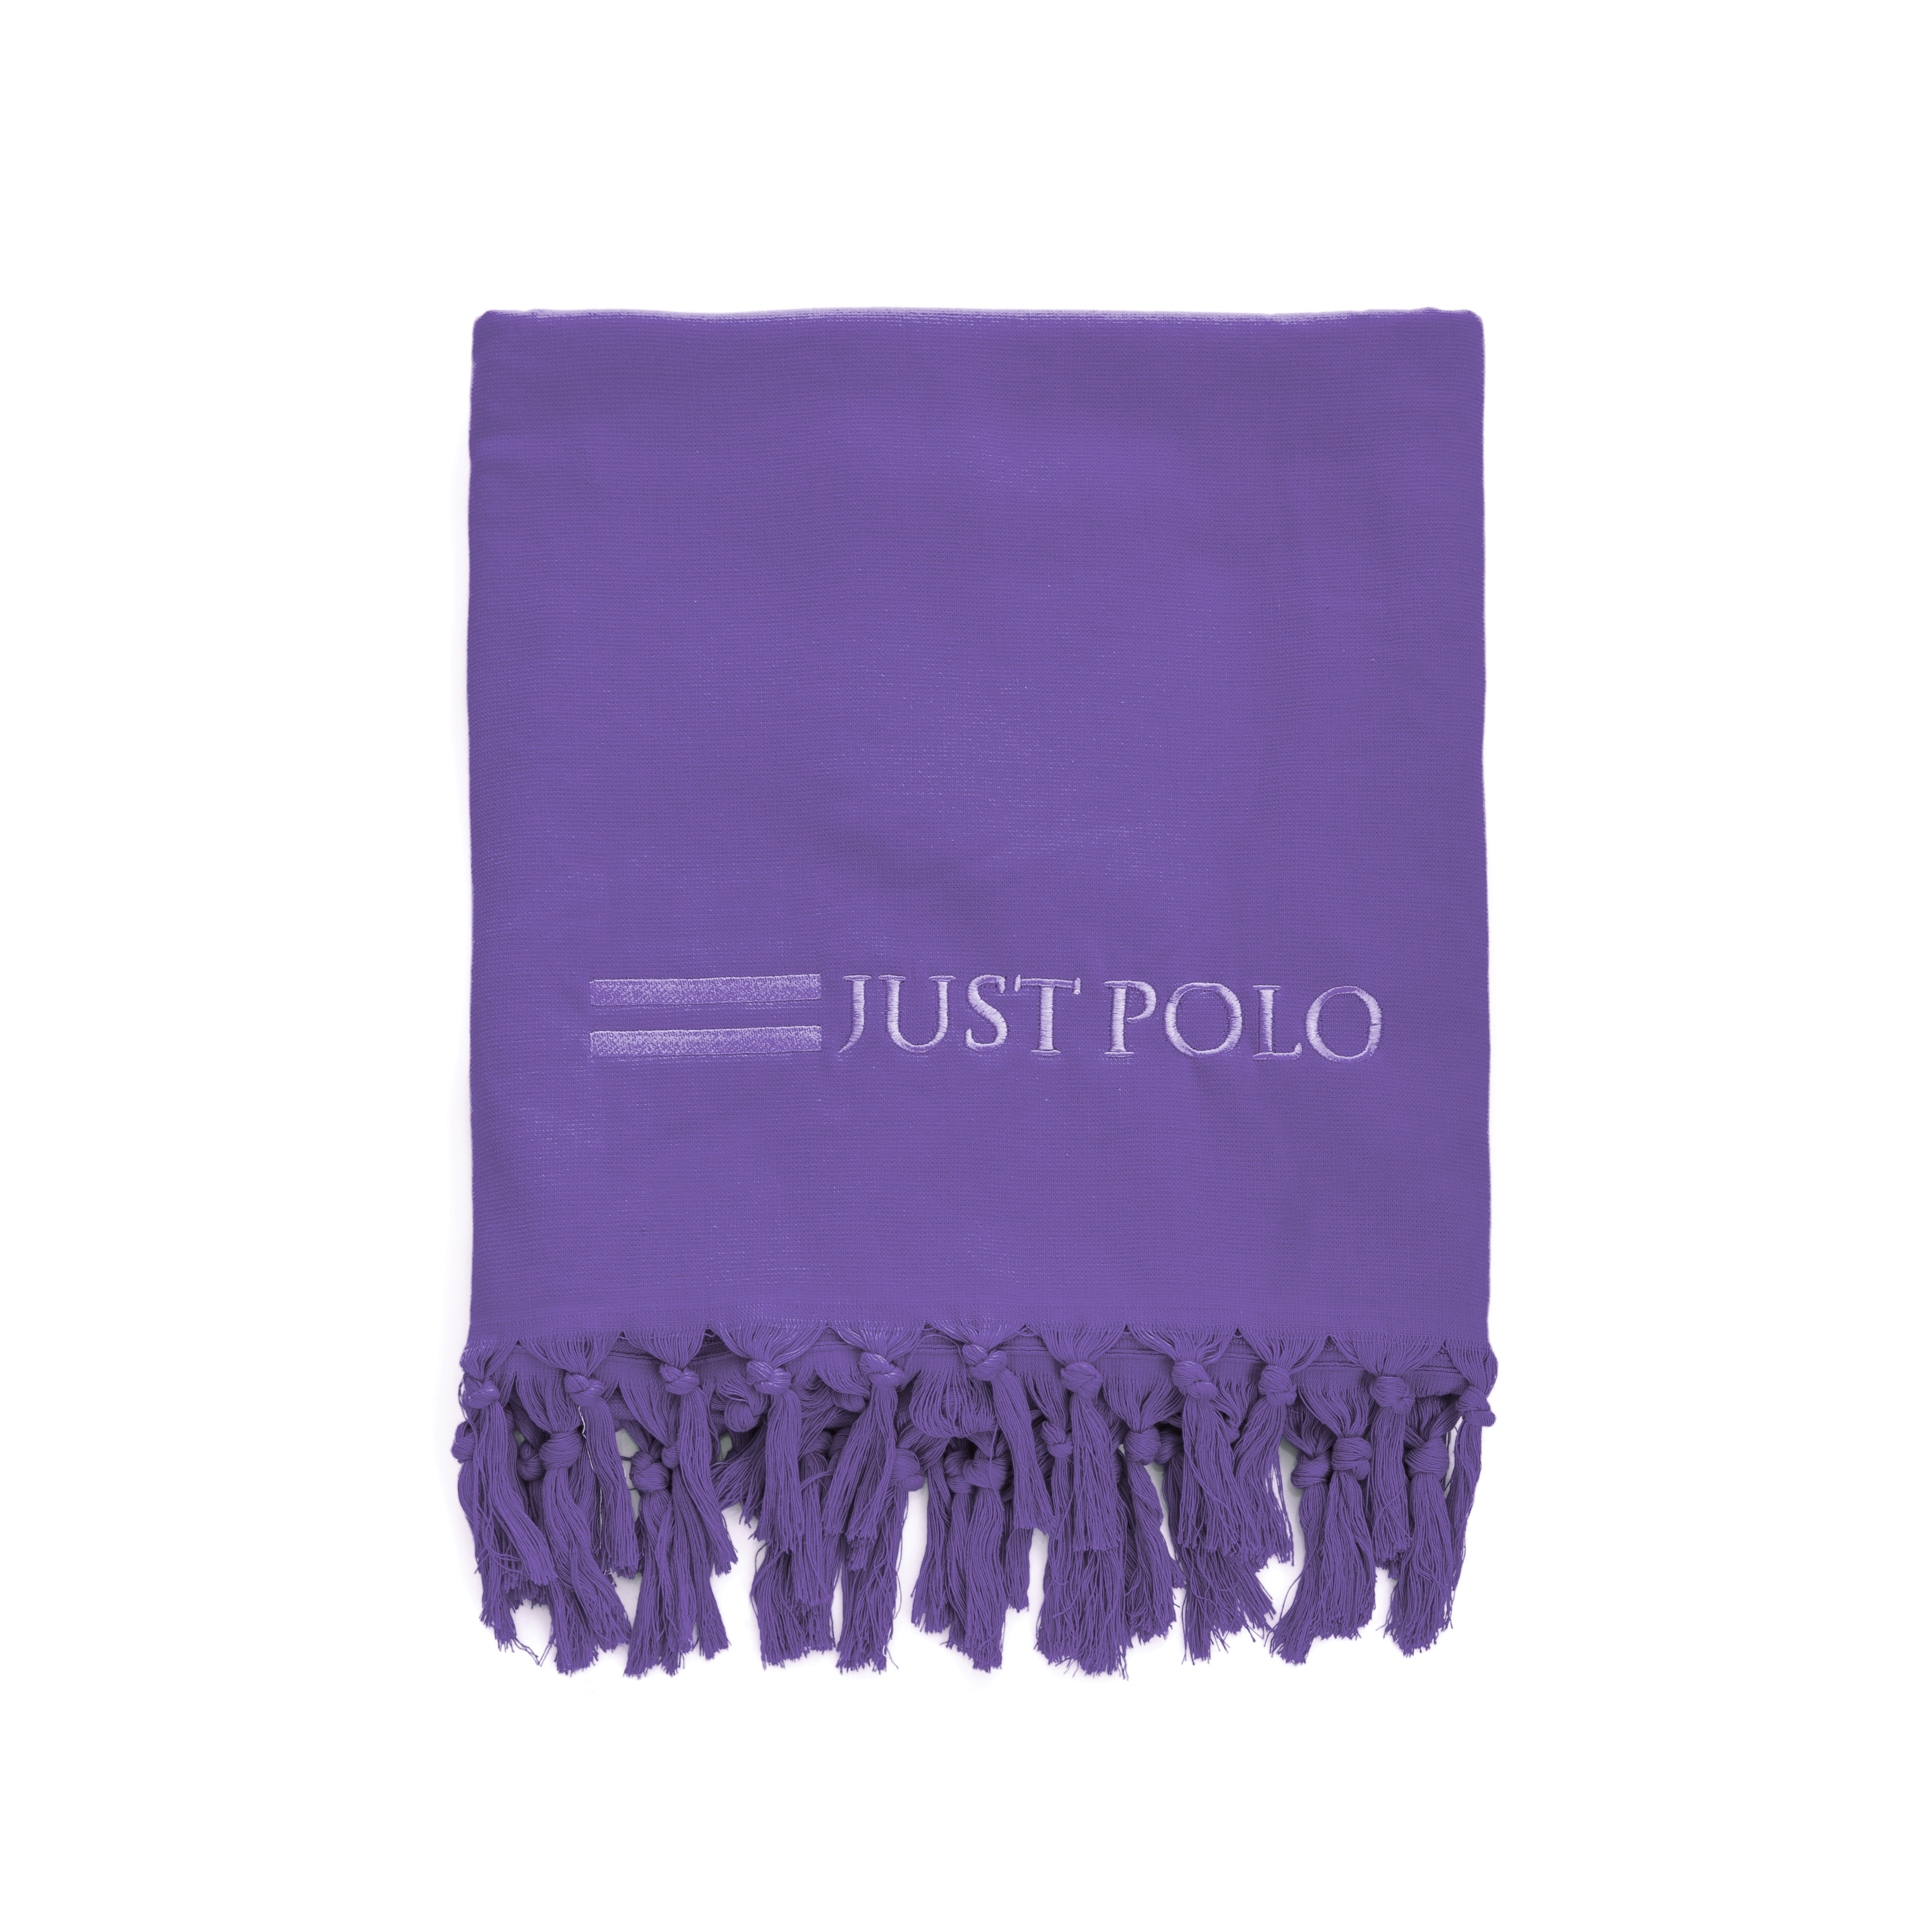 JUST POLO - Πετσέτα θαλάσσης Just Polo μωβ ανδρικά αξεσουάρ πετσέτες